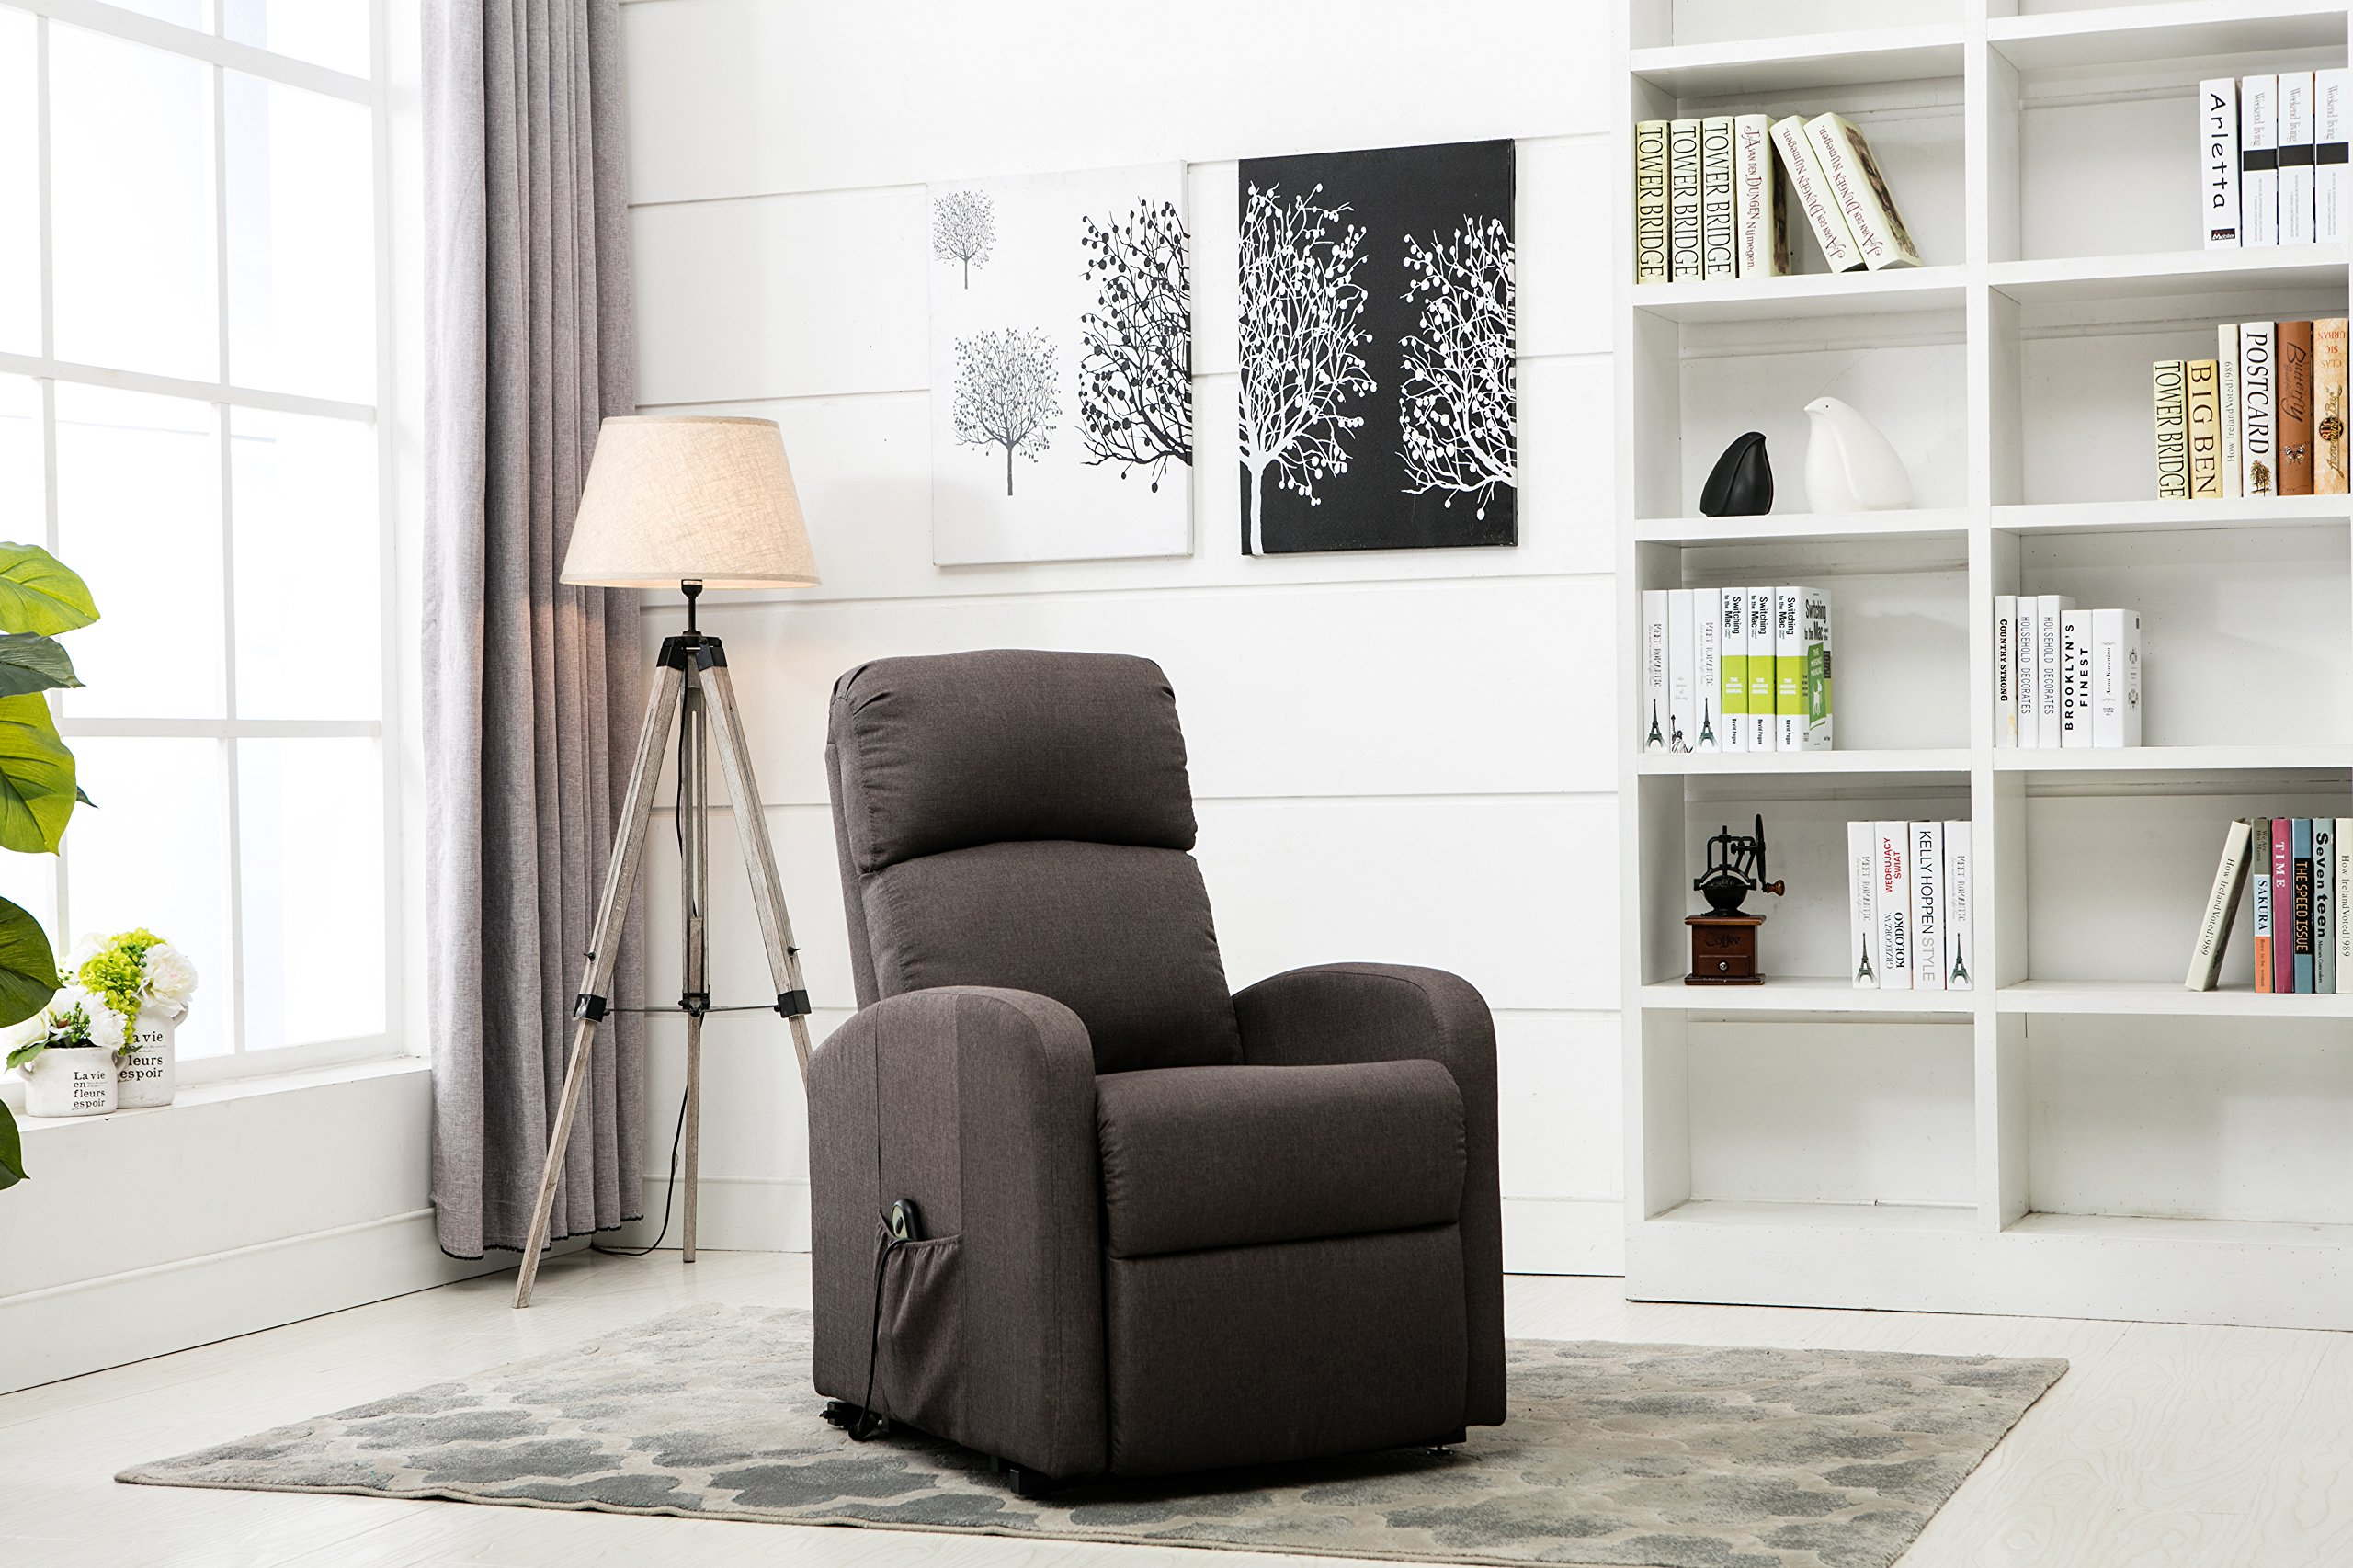 Divano Roma Furniture - Classic Plush Power Lift Recliner Living Room Chair (Dark Grey)